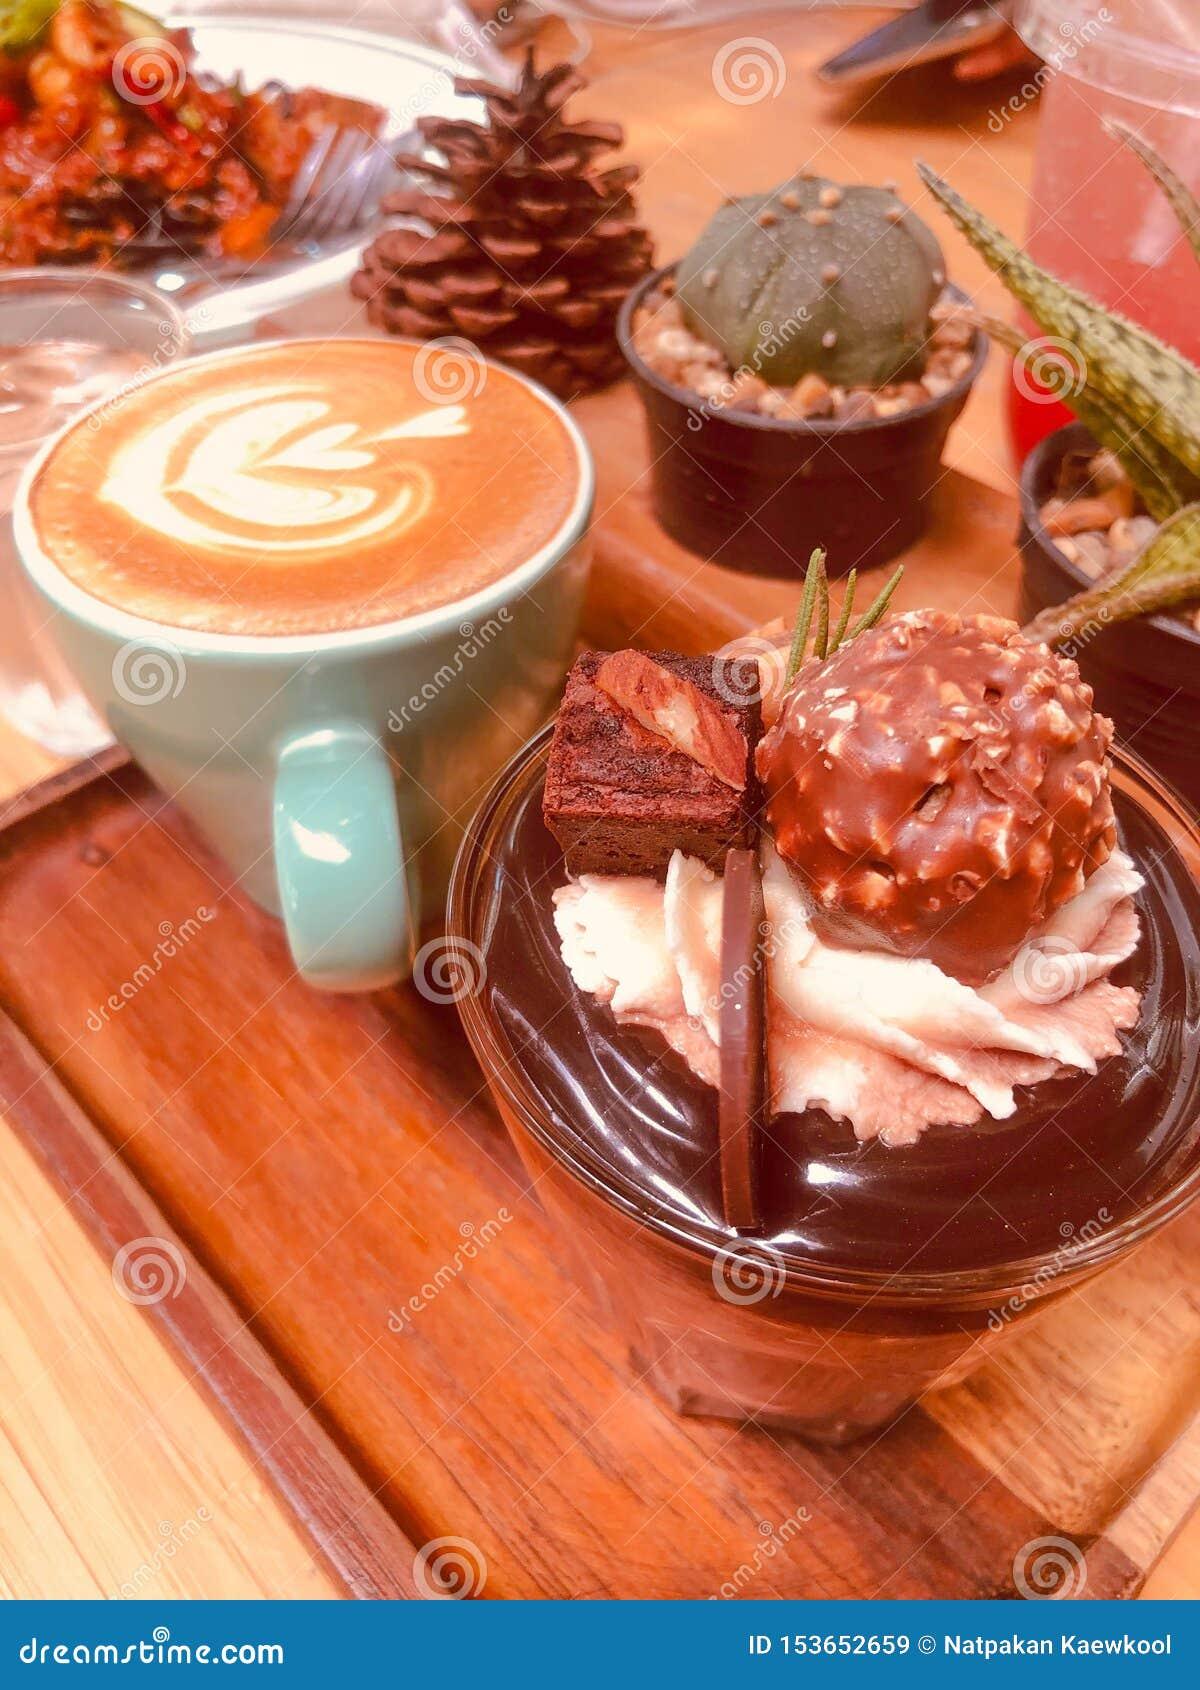 Chocolate cake and cappuccino coffee